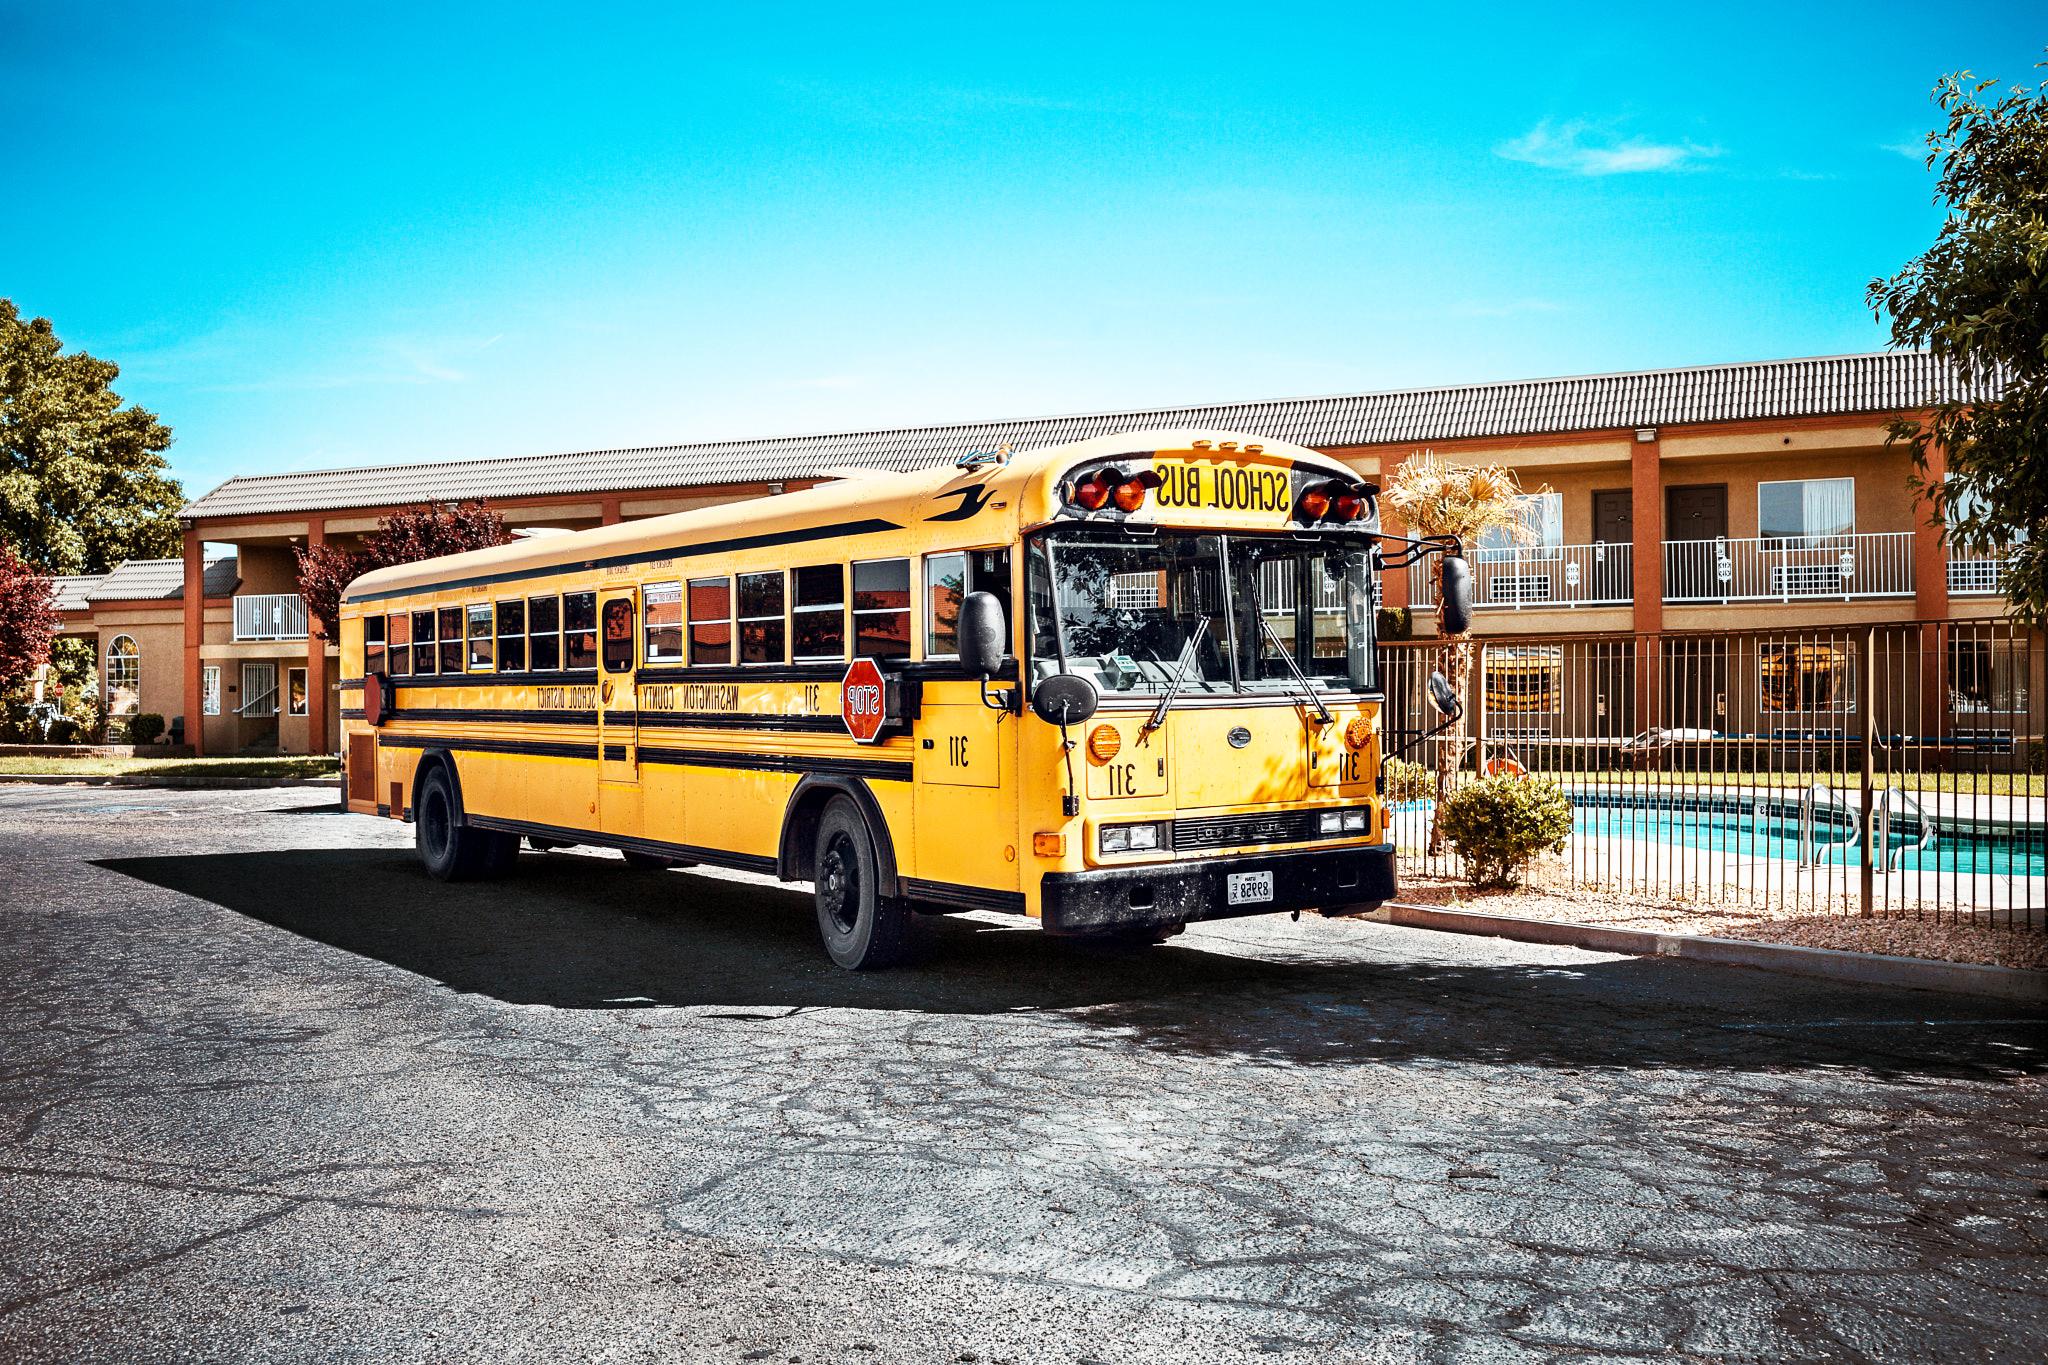 Schoolbus Wallpaper HD Worlds Greatest Art Site 2048x1365